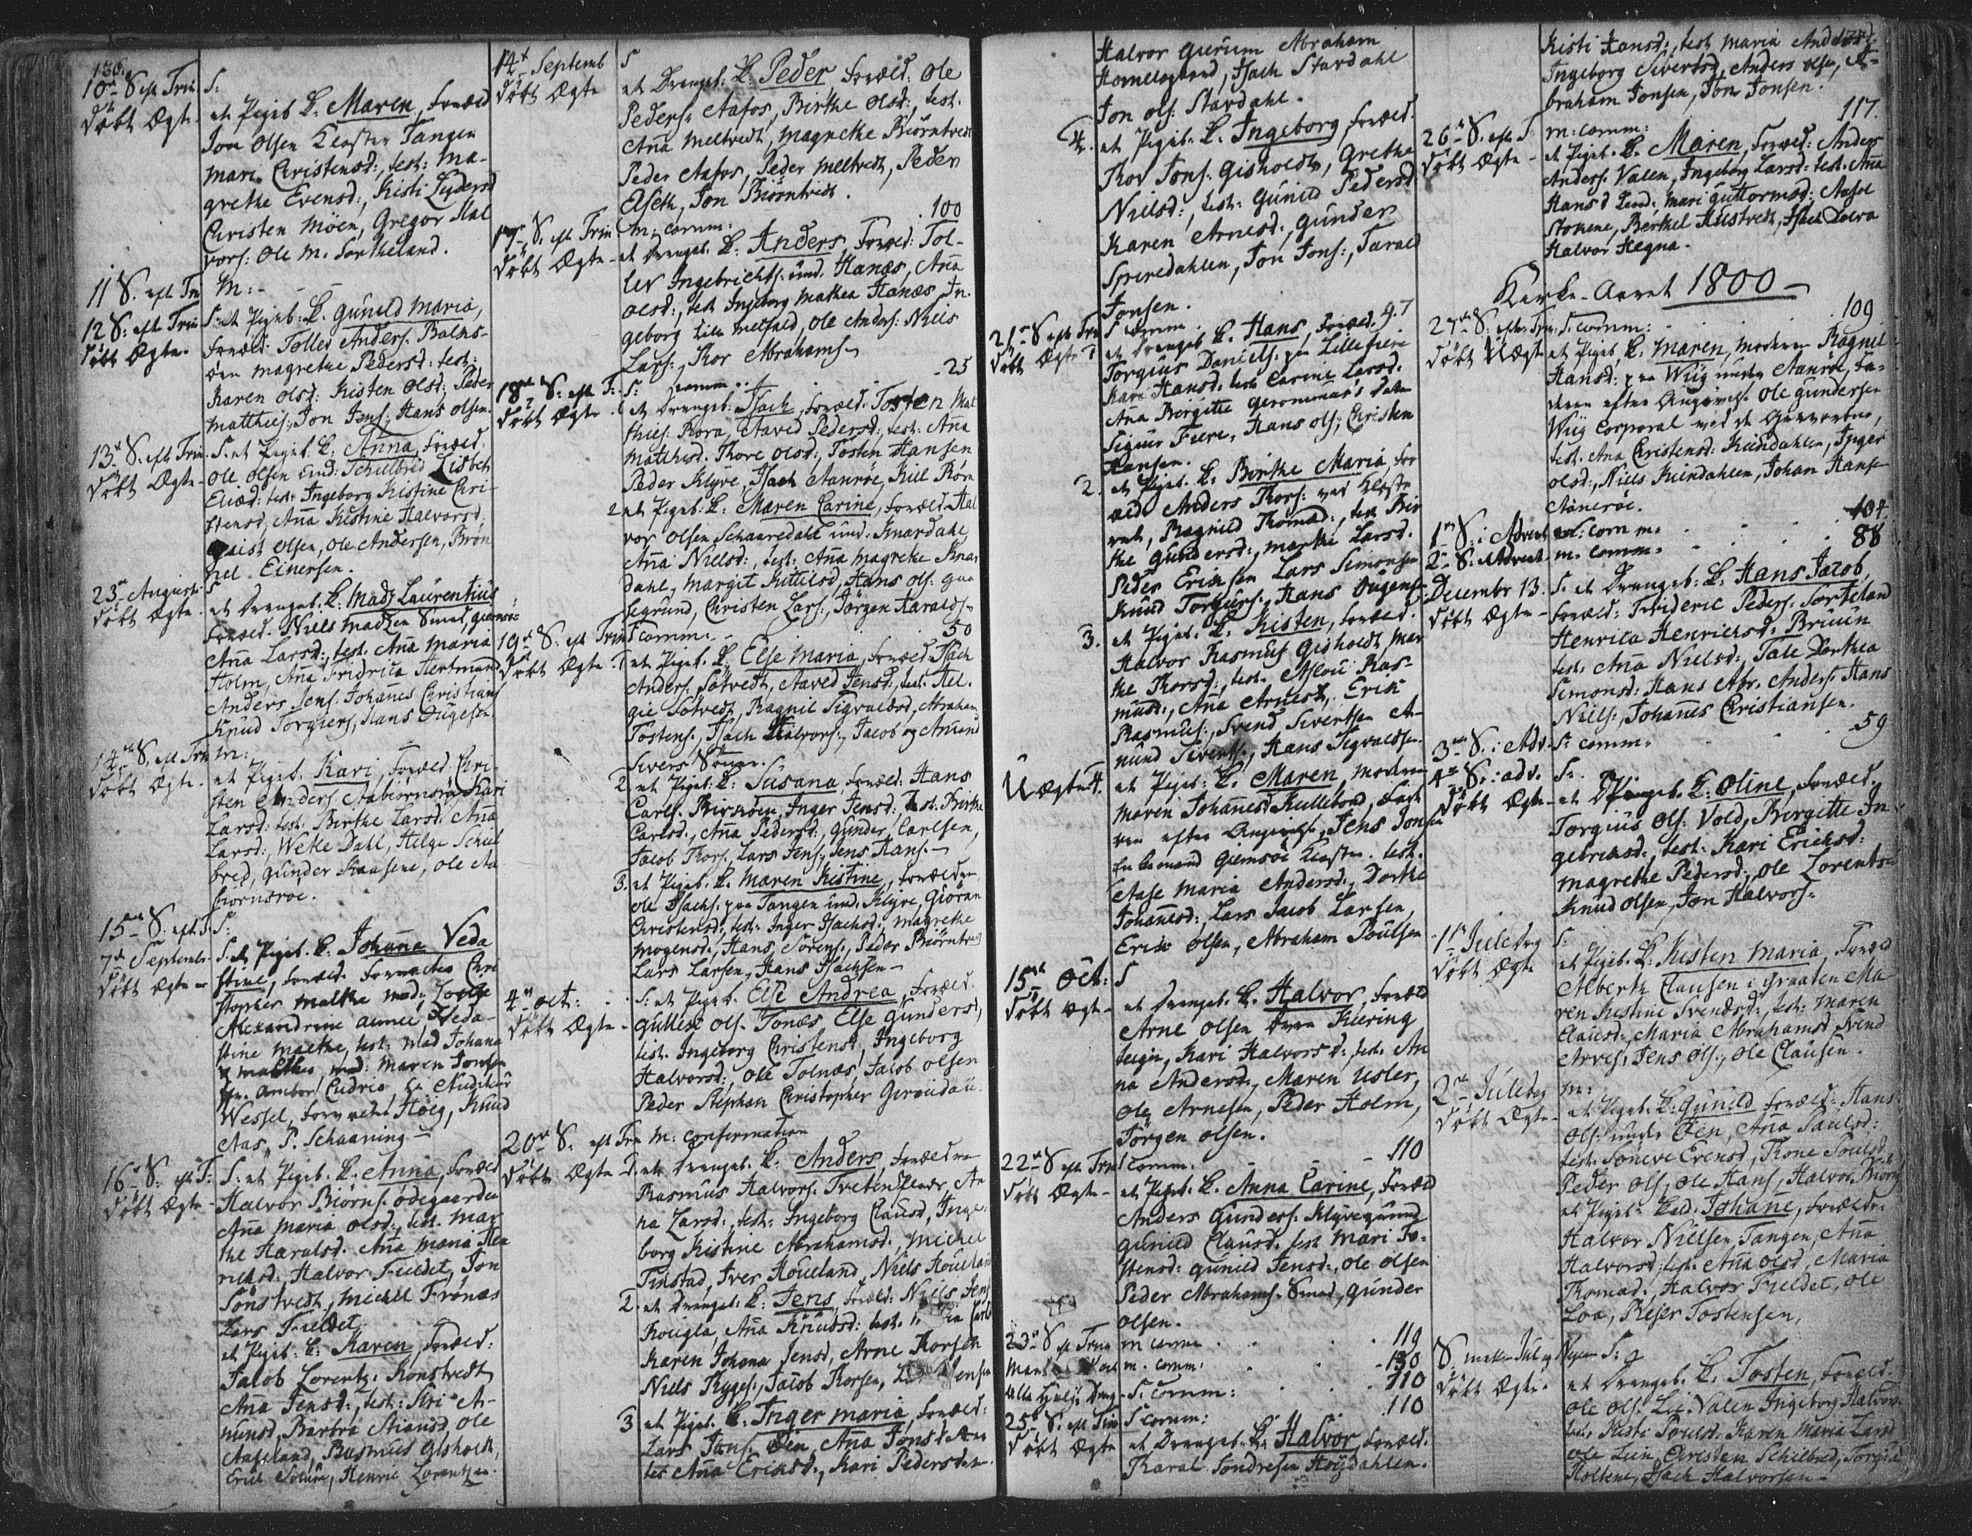 SAKO, Solum kirkebøker, F/Fa/L0003: Ministerialbok nr. I 3, 1761-1814, s. 136-137